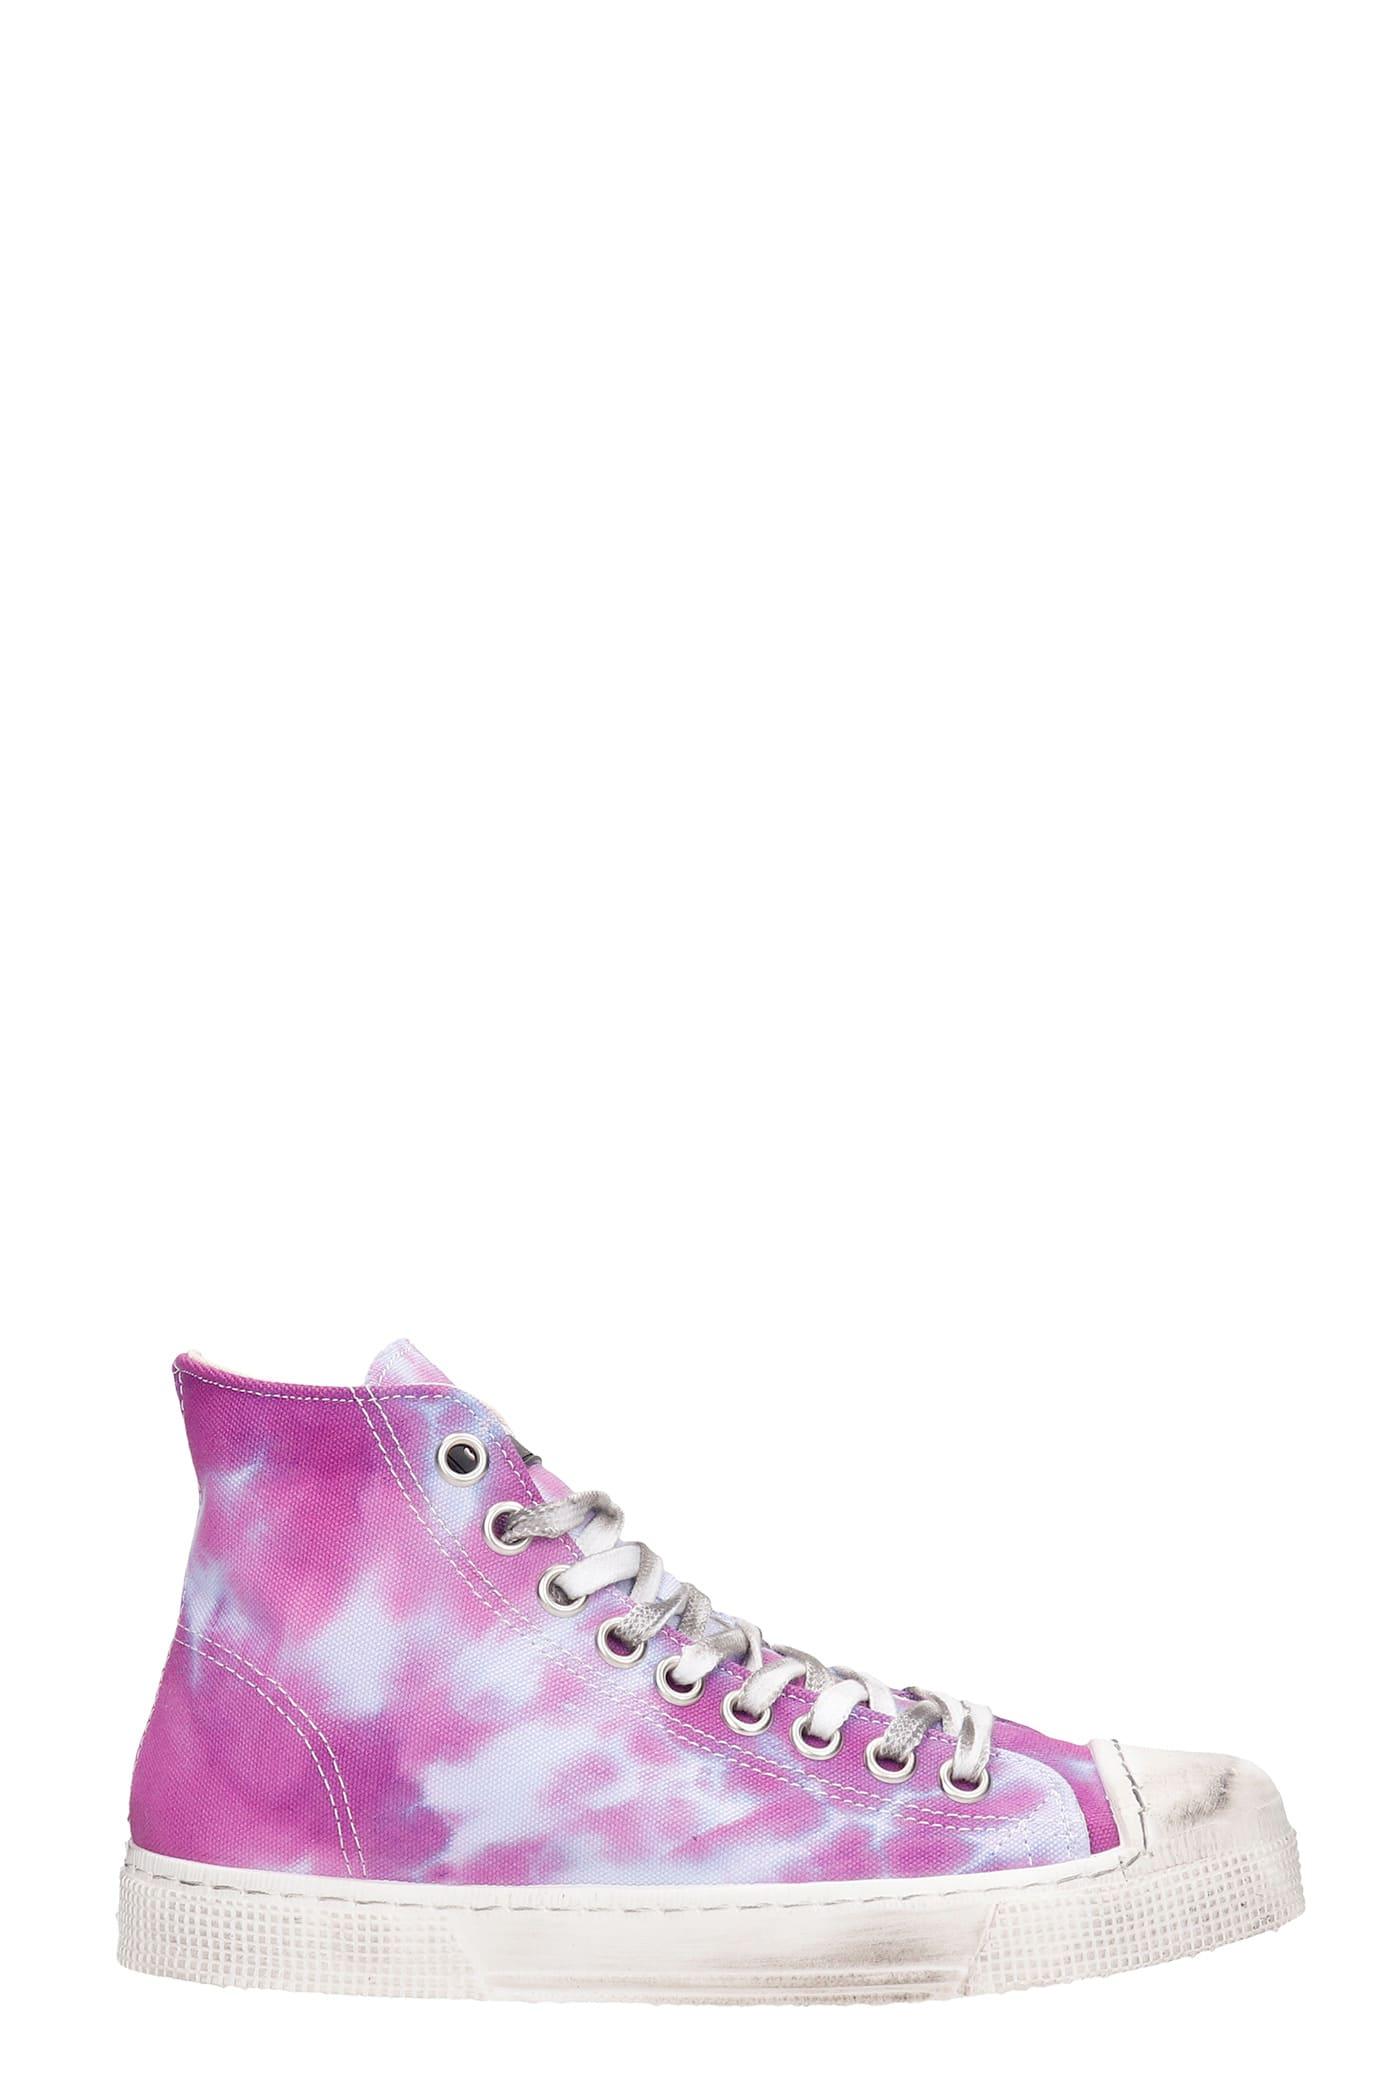 J.m High Sneakers In Viola Canvas